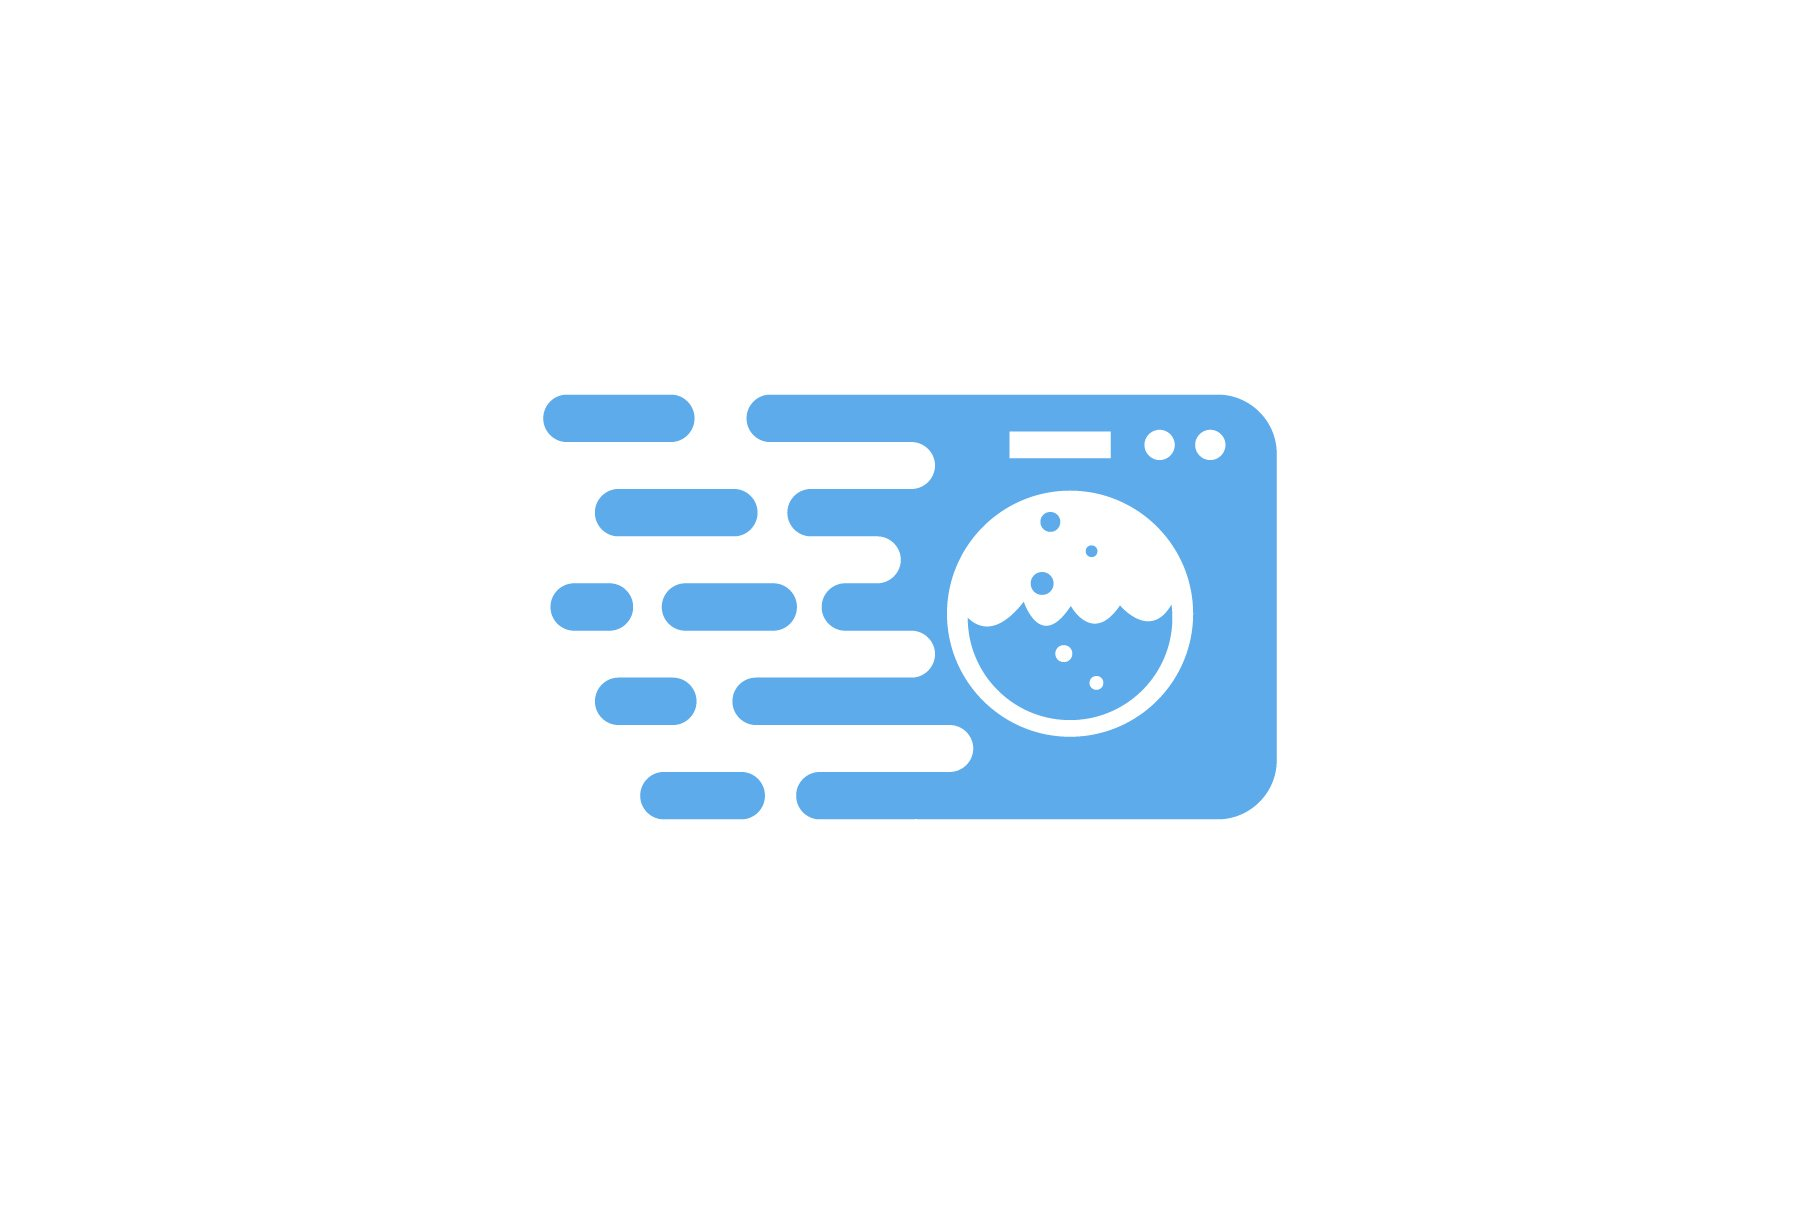 fast laundry logo 333305 logos design bundles fast laundry logo